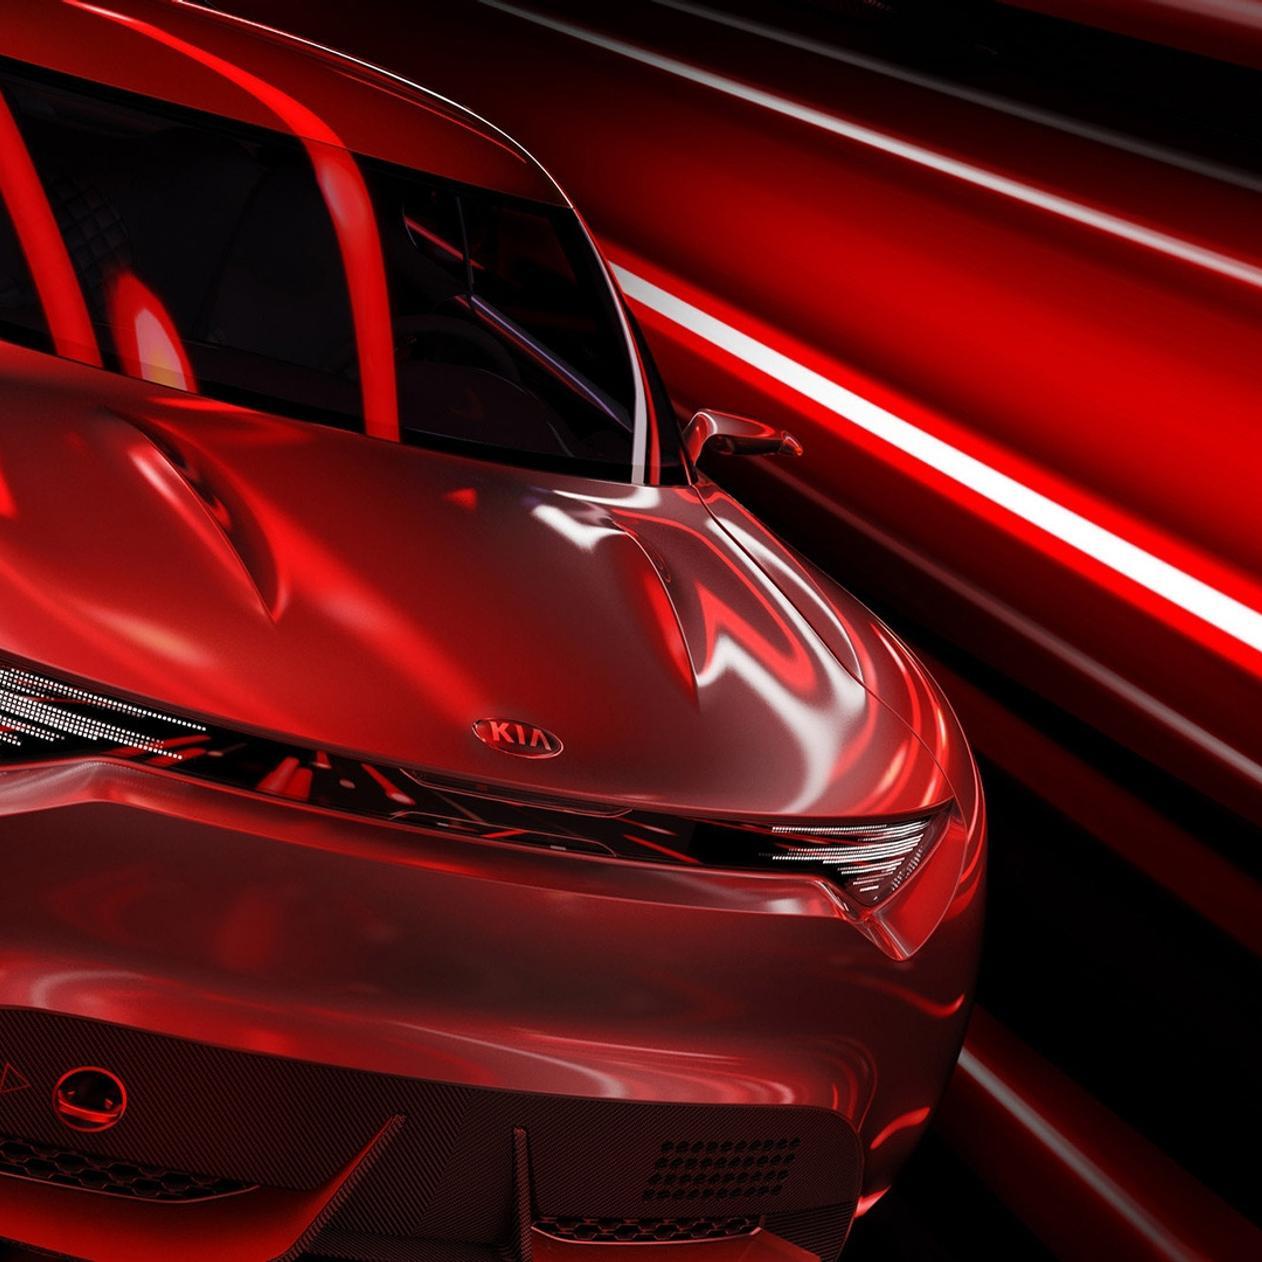 Red Kia Sport Car Concept